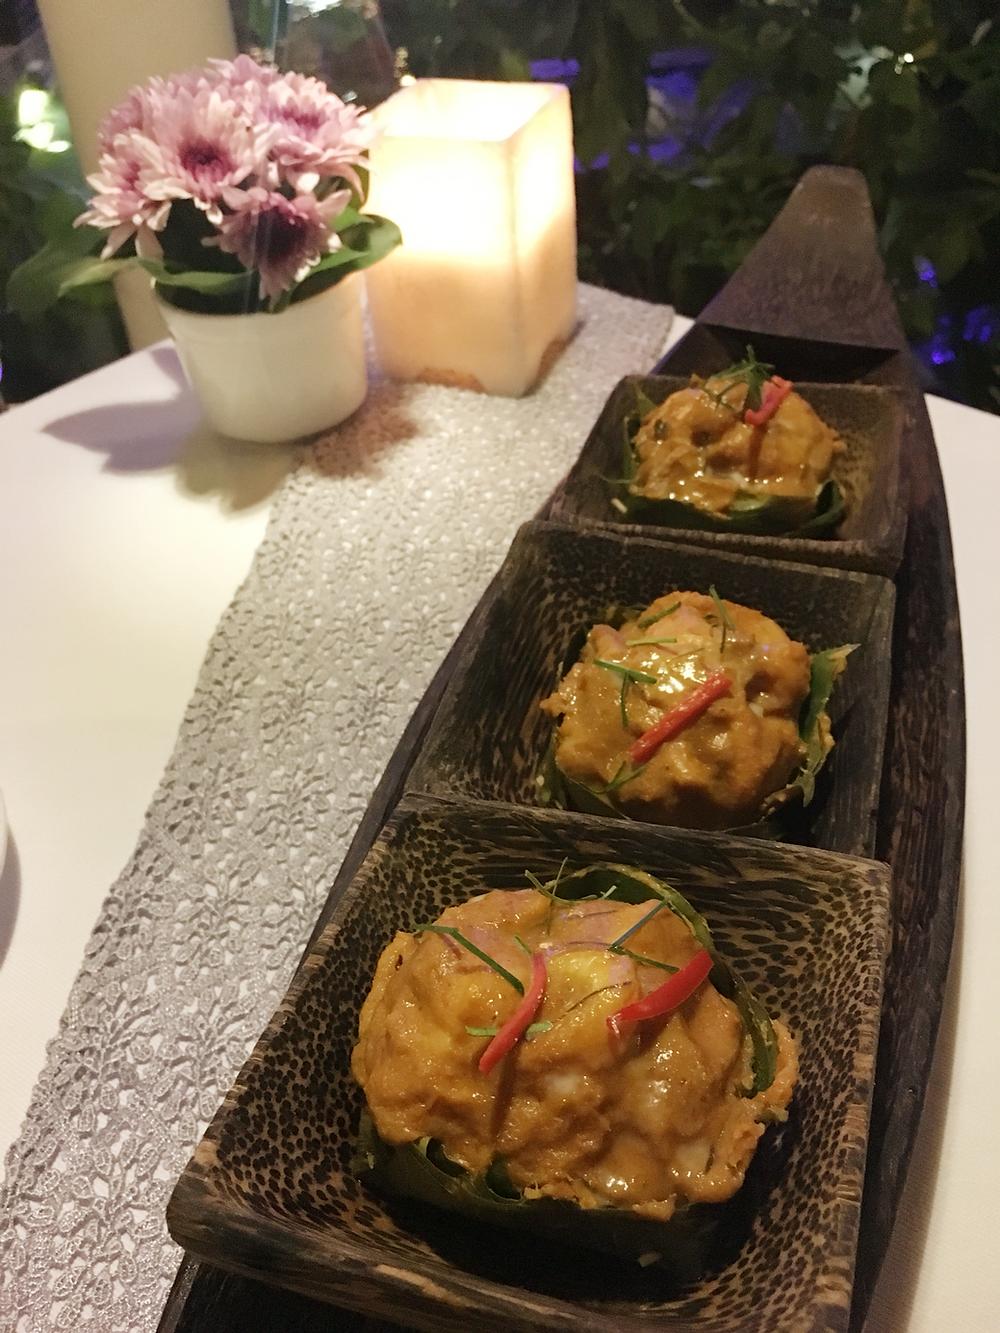 Fish amok for dinner at Malis Restaurant Phnom Penh